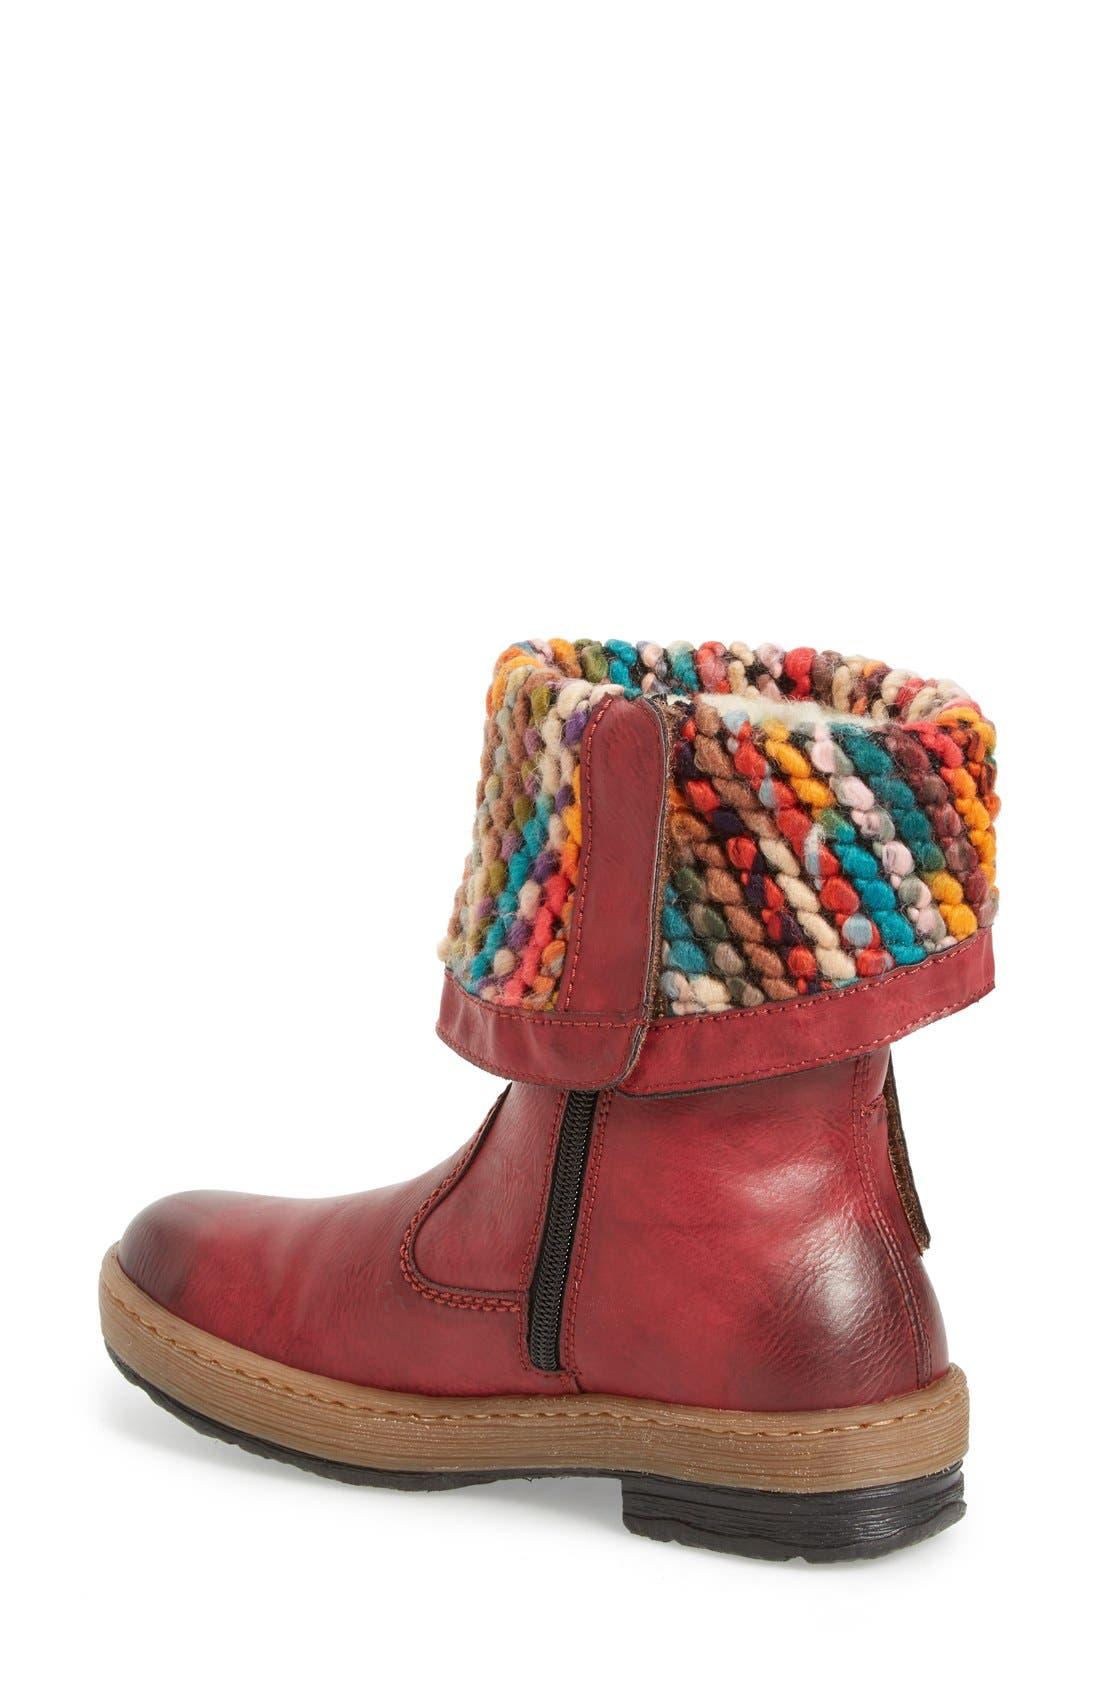 Alternate Image 2  - Rieker Antistress 'Felicitas 98' Foldover Boot (Women)